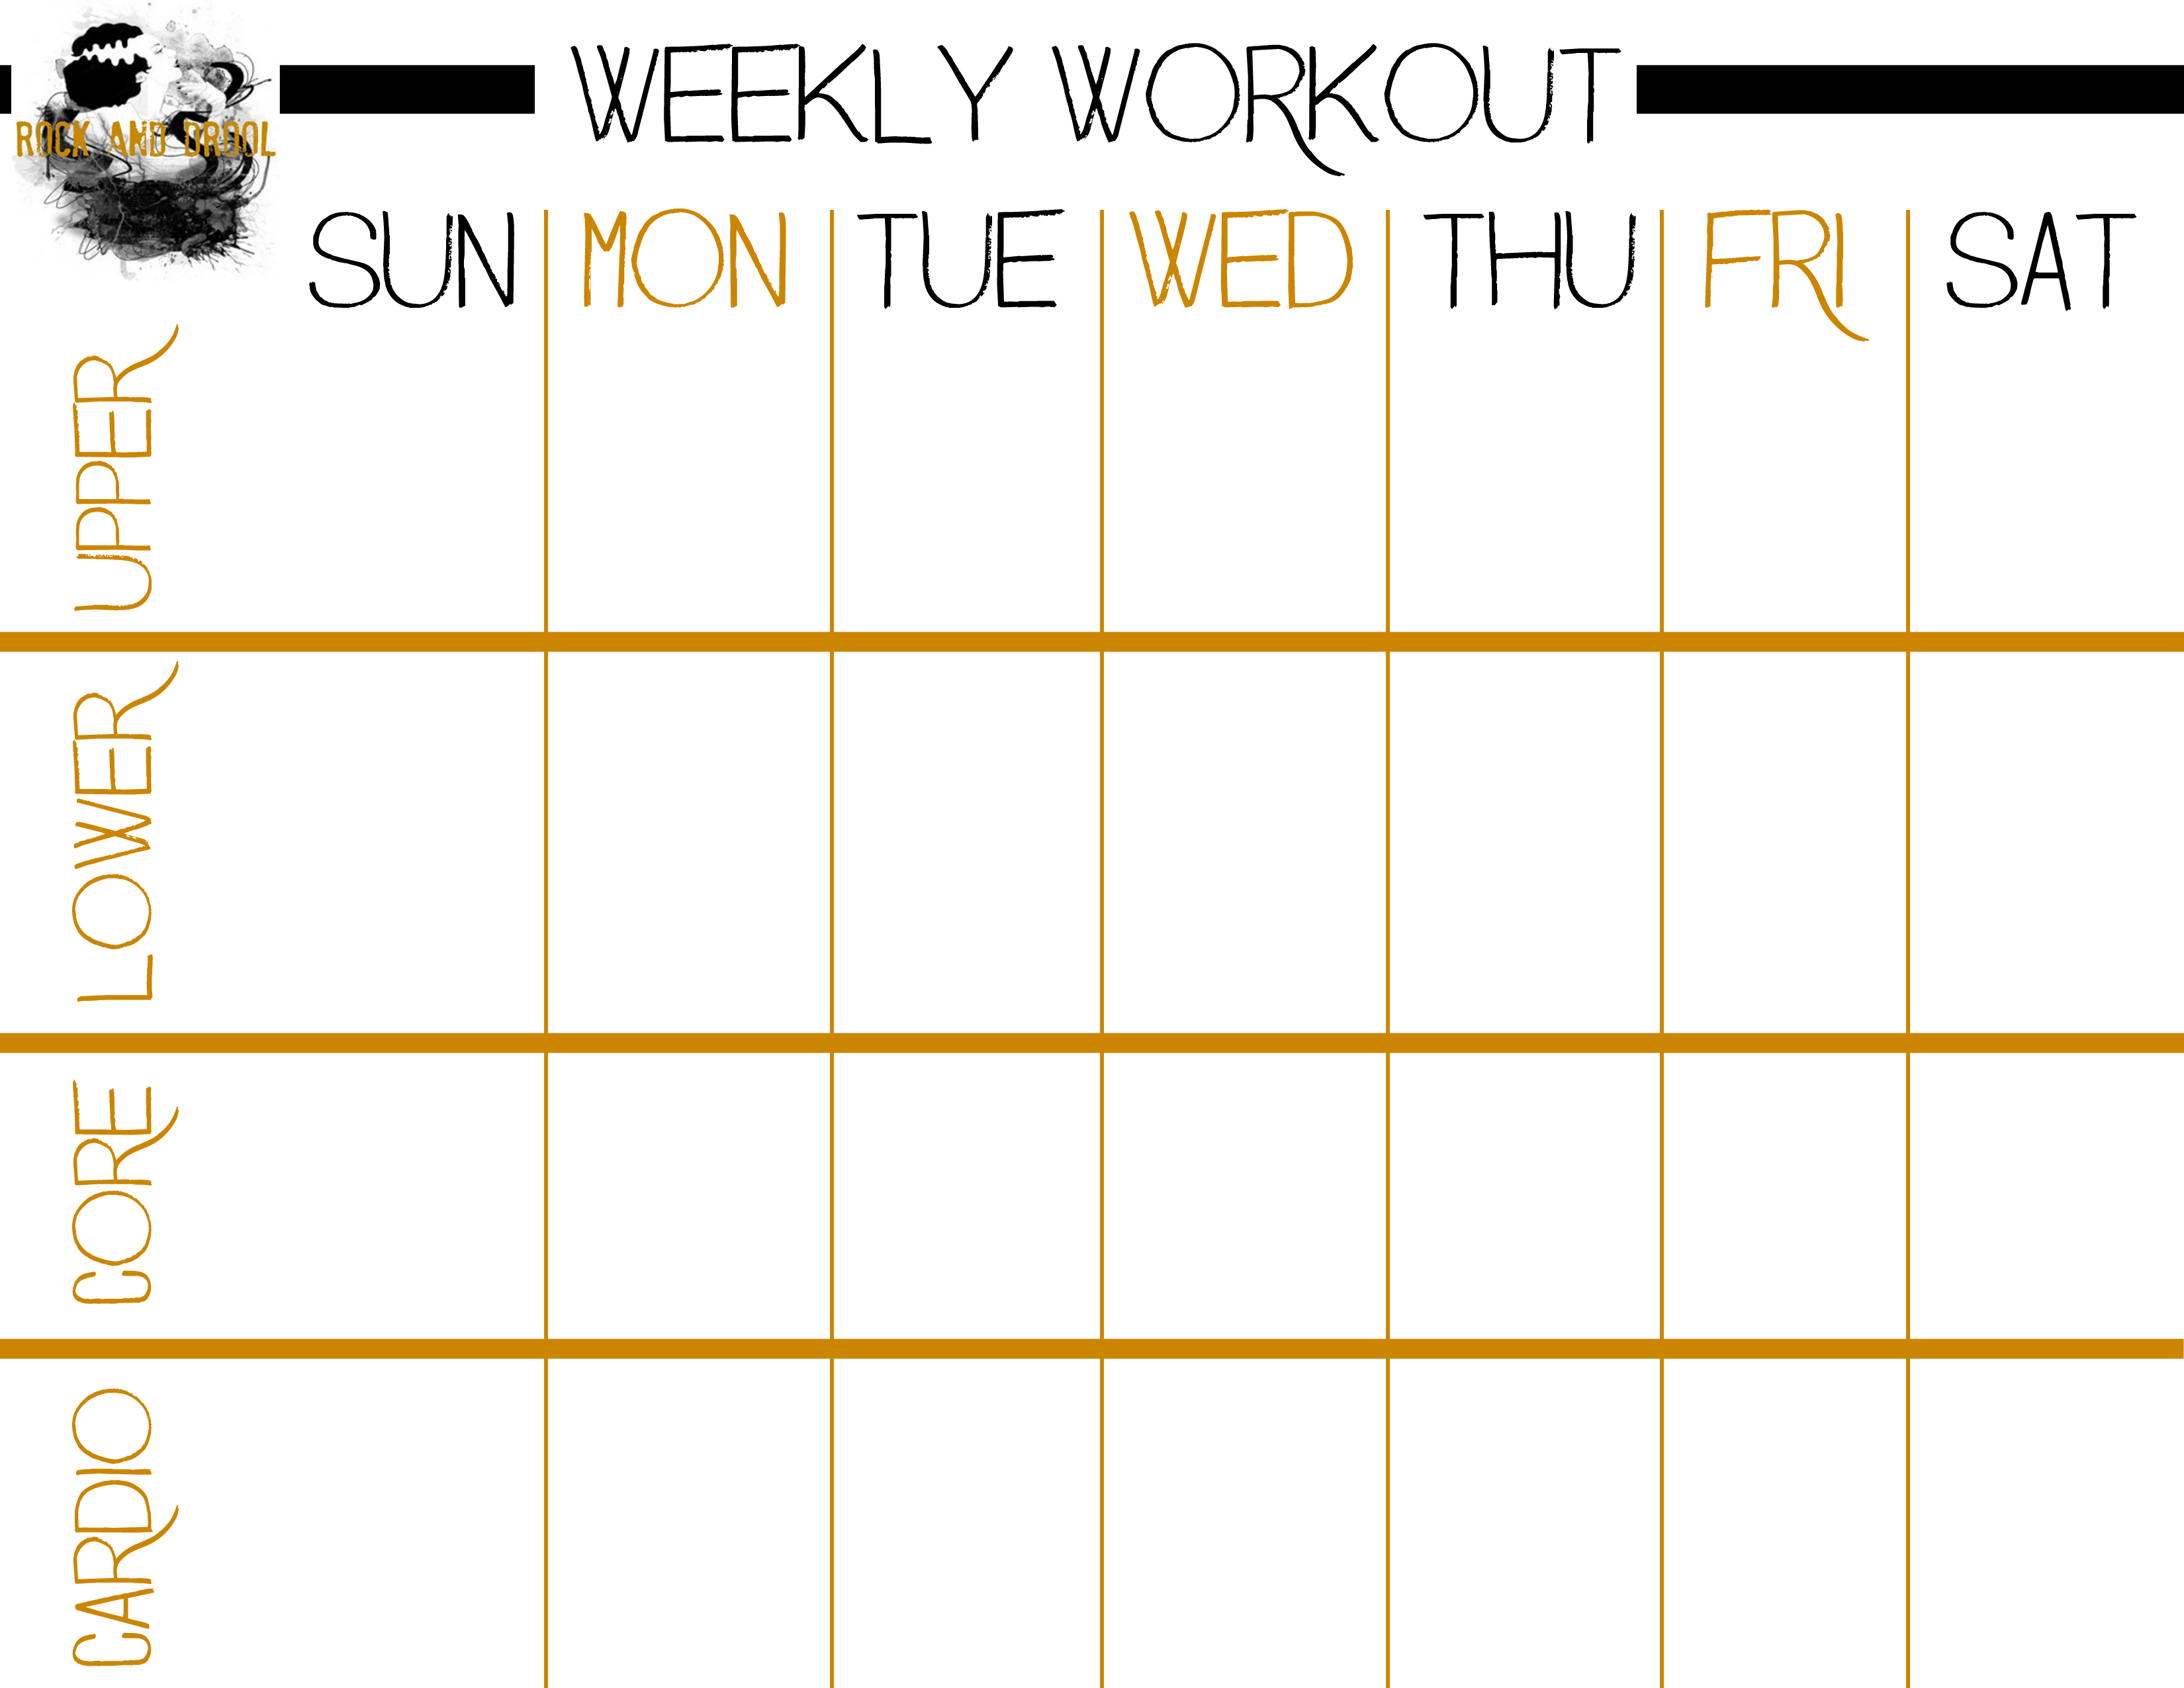 Basic Full Body Workout Plus Free Printable Workout Sheet - Rock And - Free Printable Gym Workout Plans